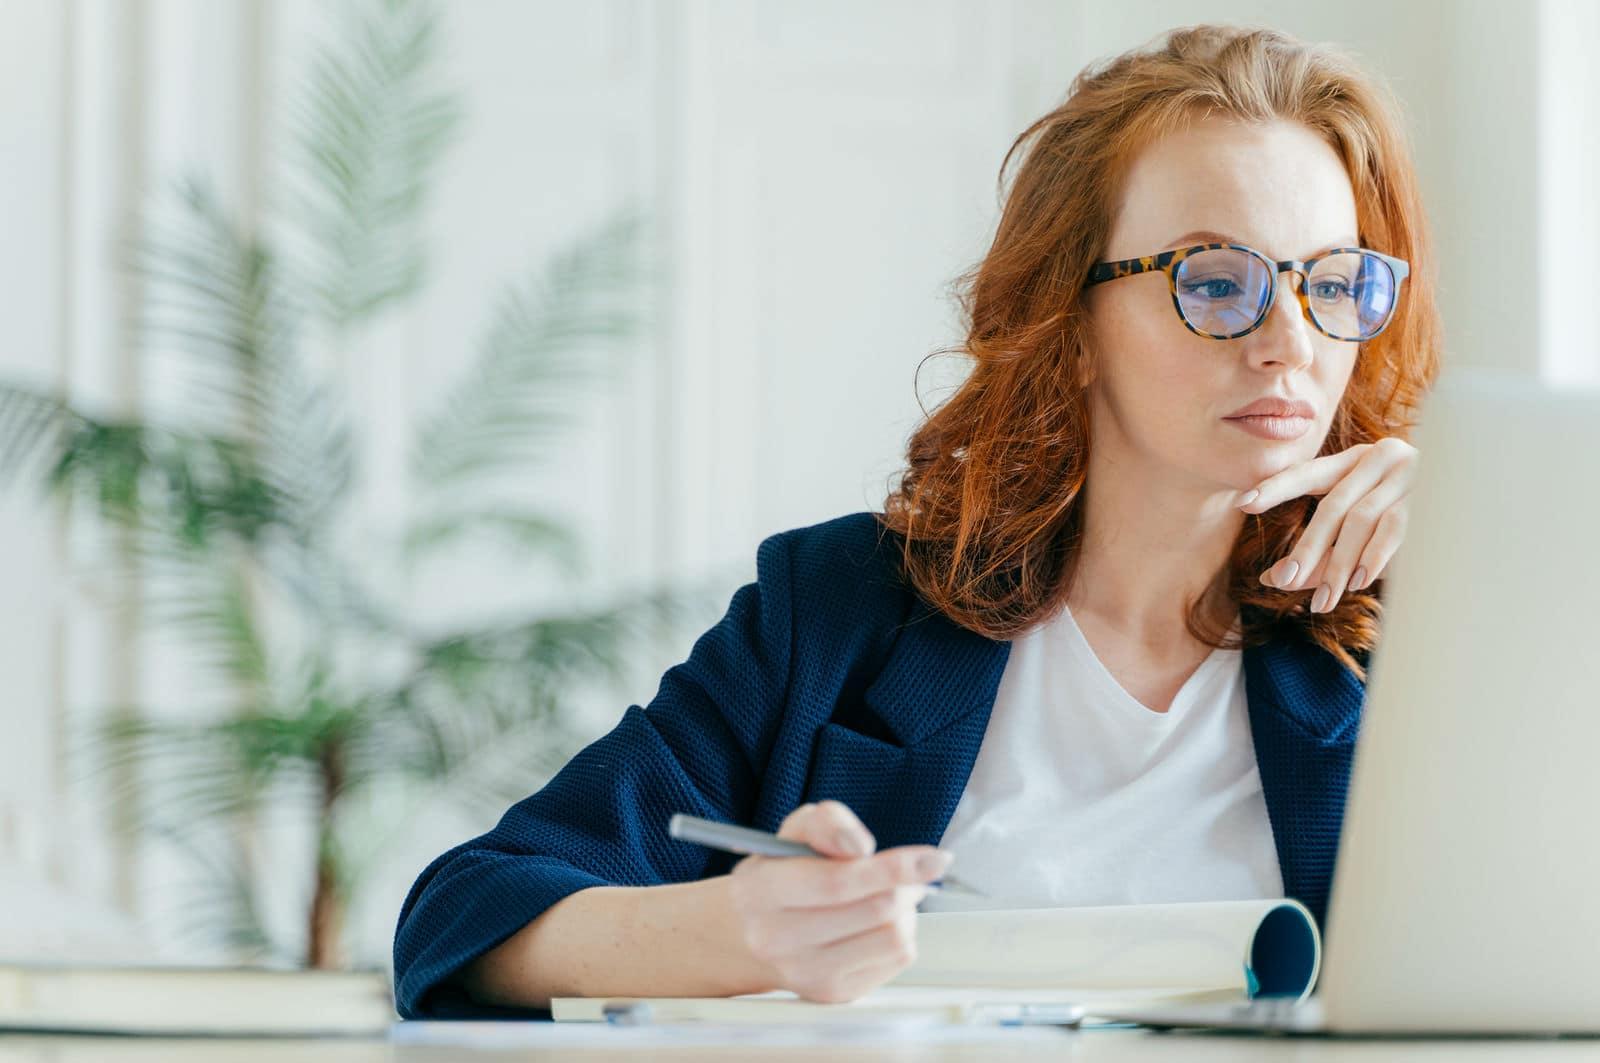 Three Proven Hacks To Avoid Distractions & Improve Focus